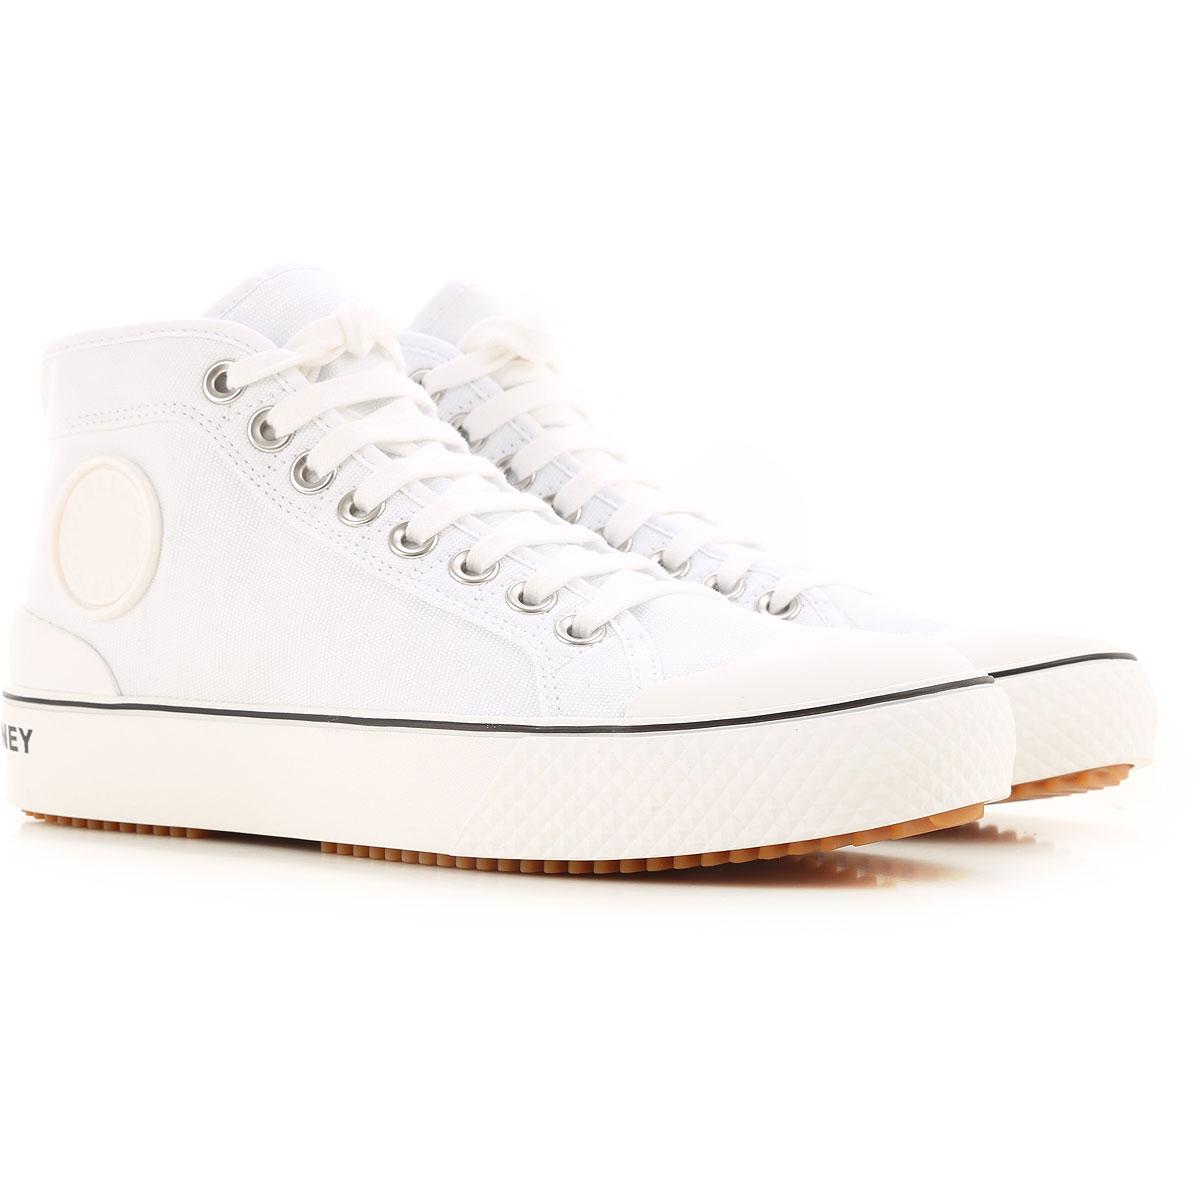 Stella McCartney Sneaker Femme, Blanc, Tissu, 2019, 35 35.5 36 36.5 37 37.5 38 39 39 39.5 40